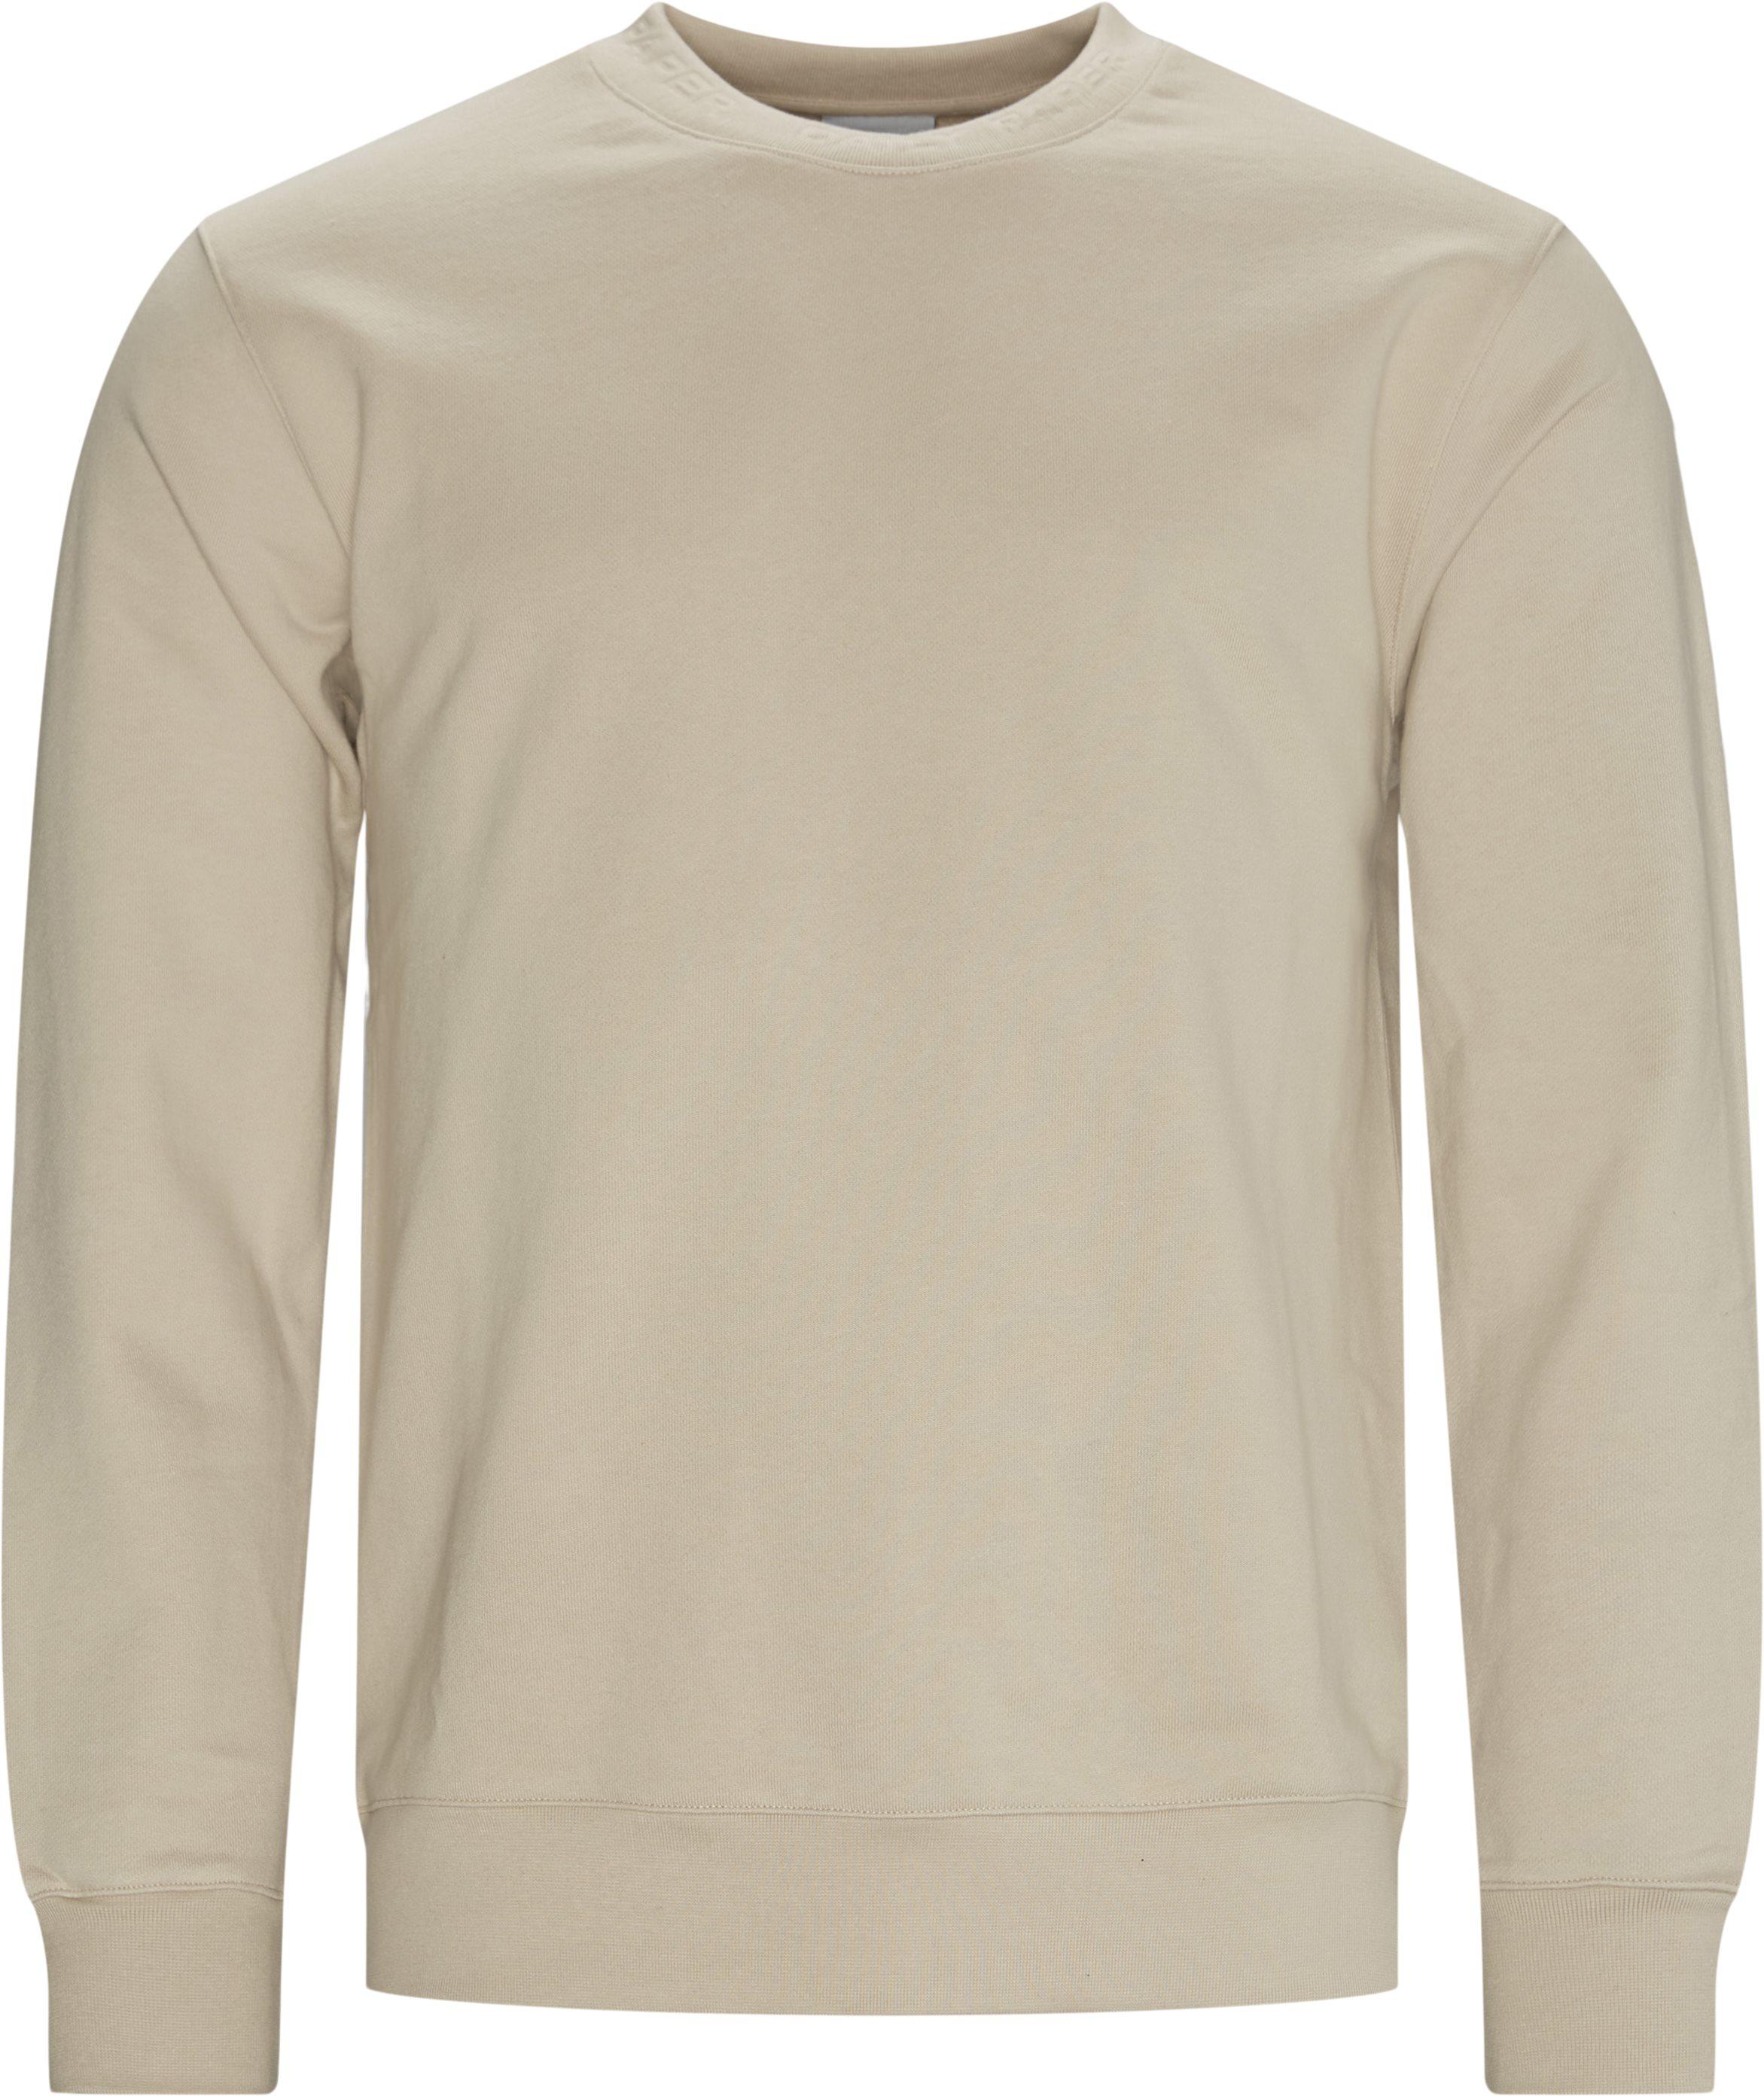 Derib Sweatshirt - Sweatshirts - Regular fit - Sand